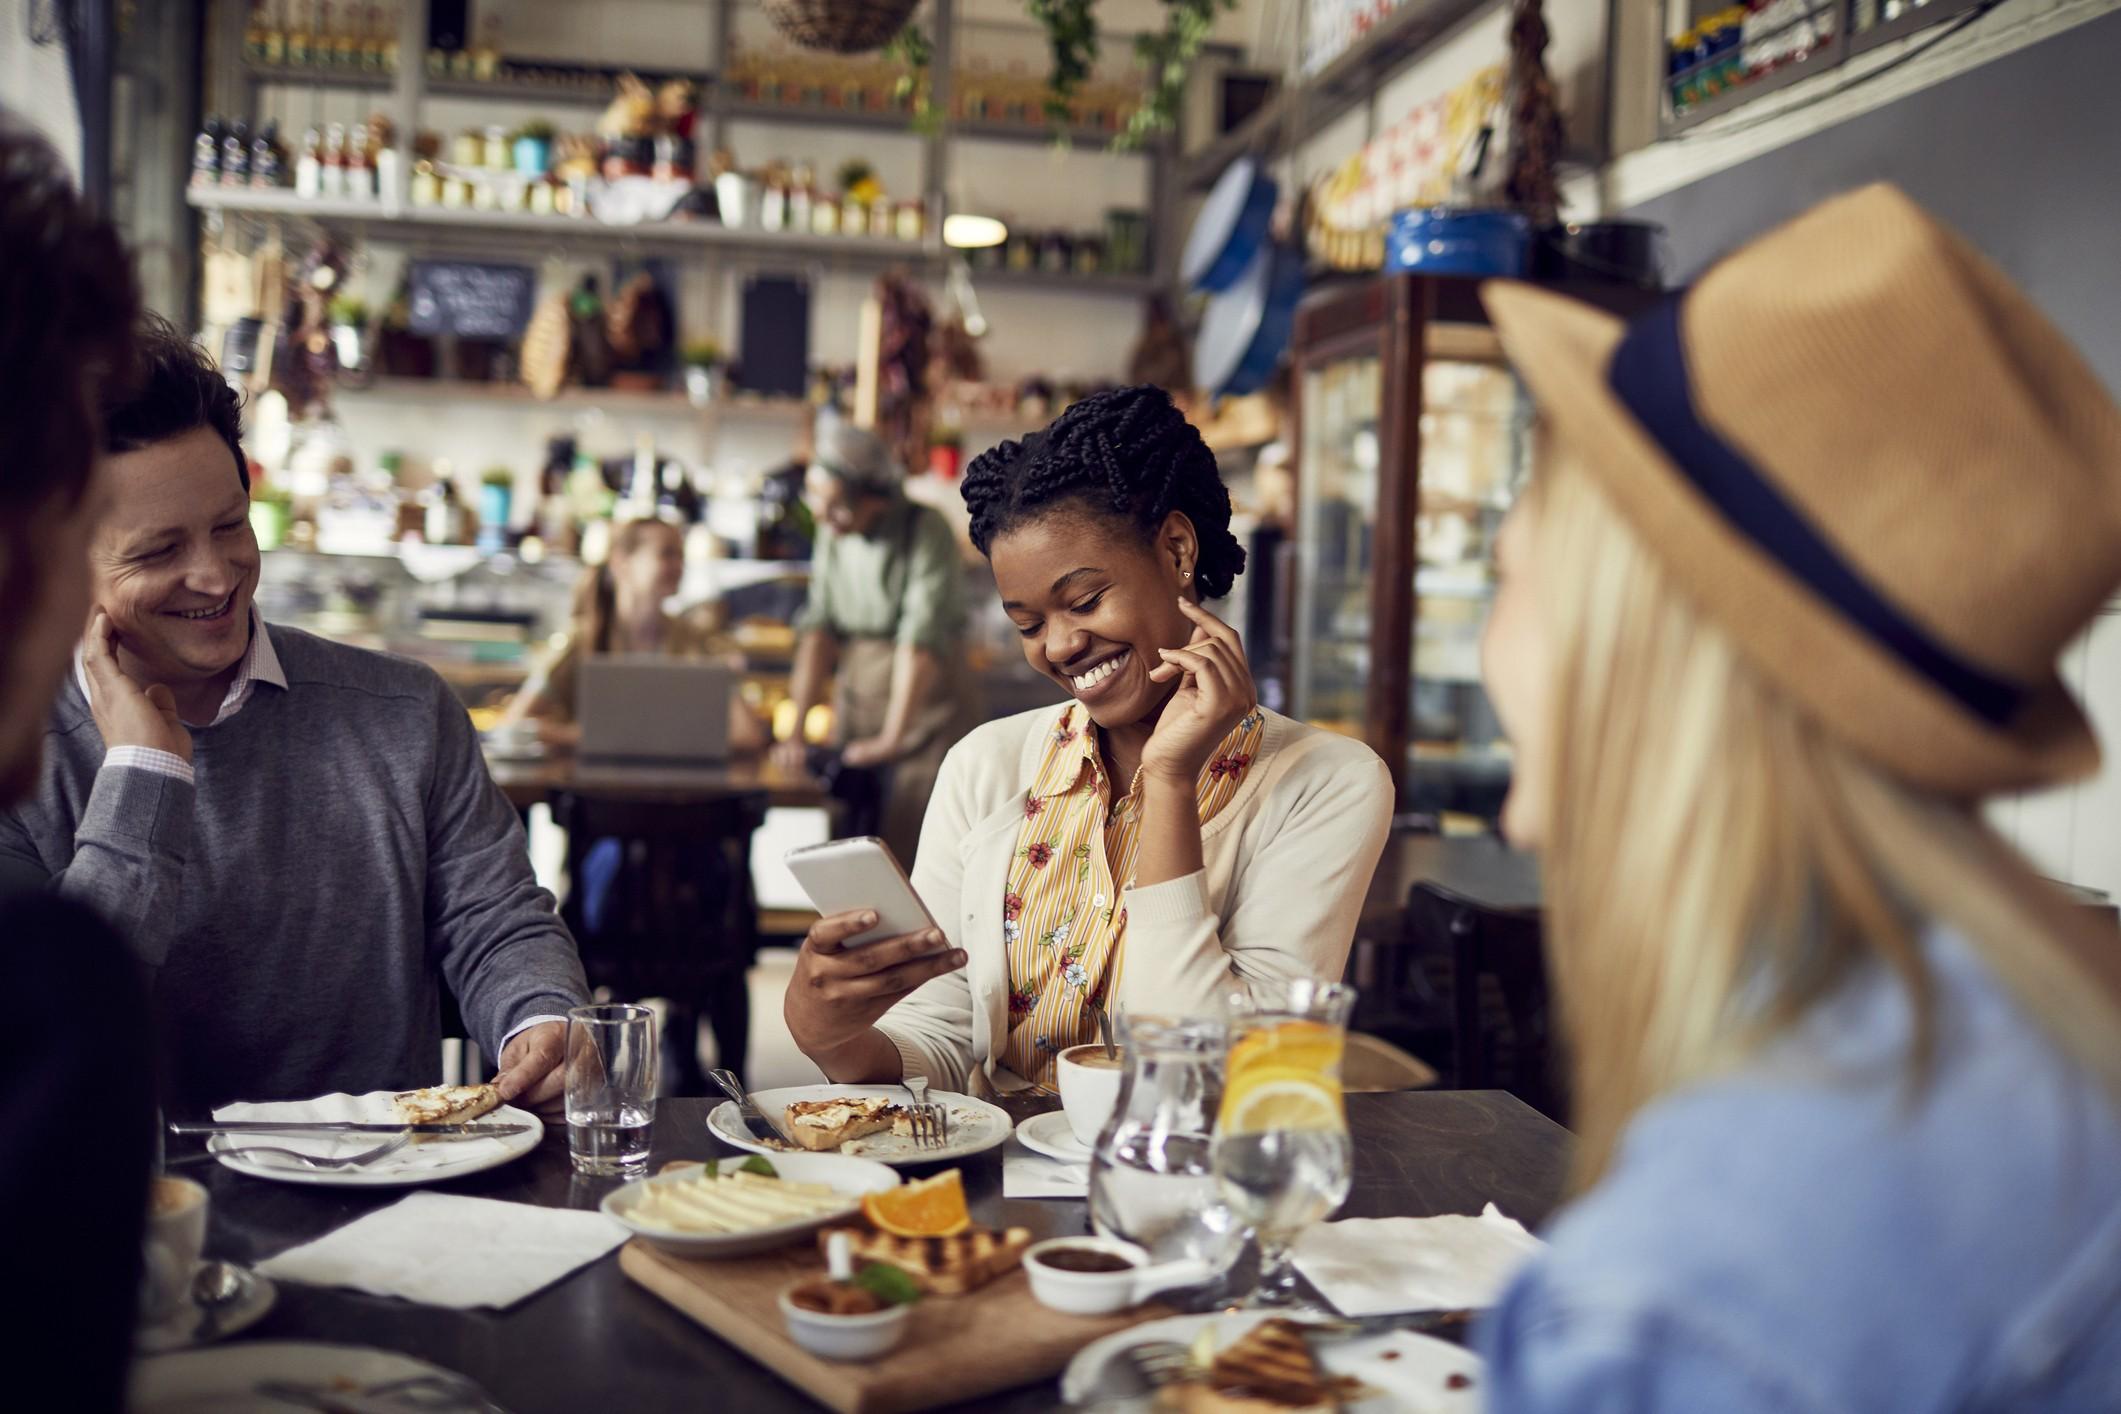 Referral marketing at restaurants